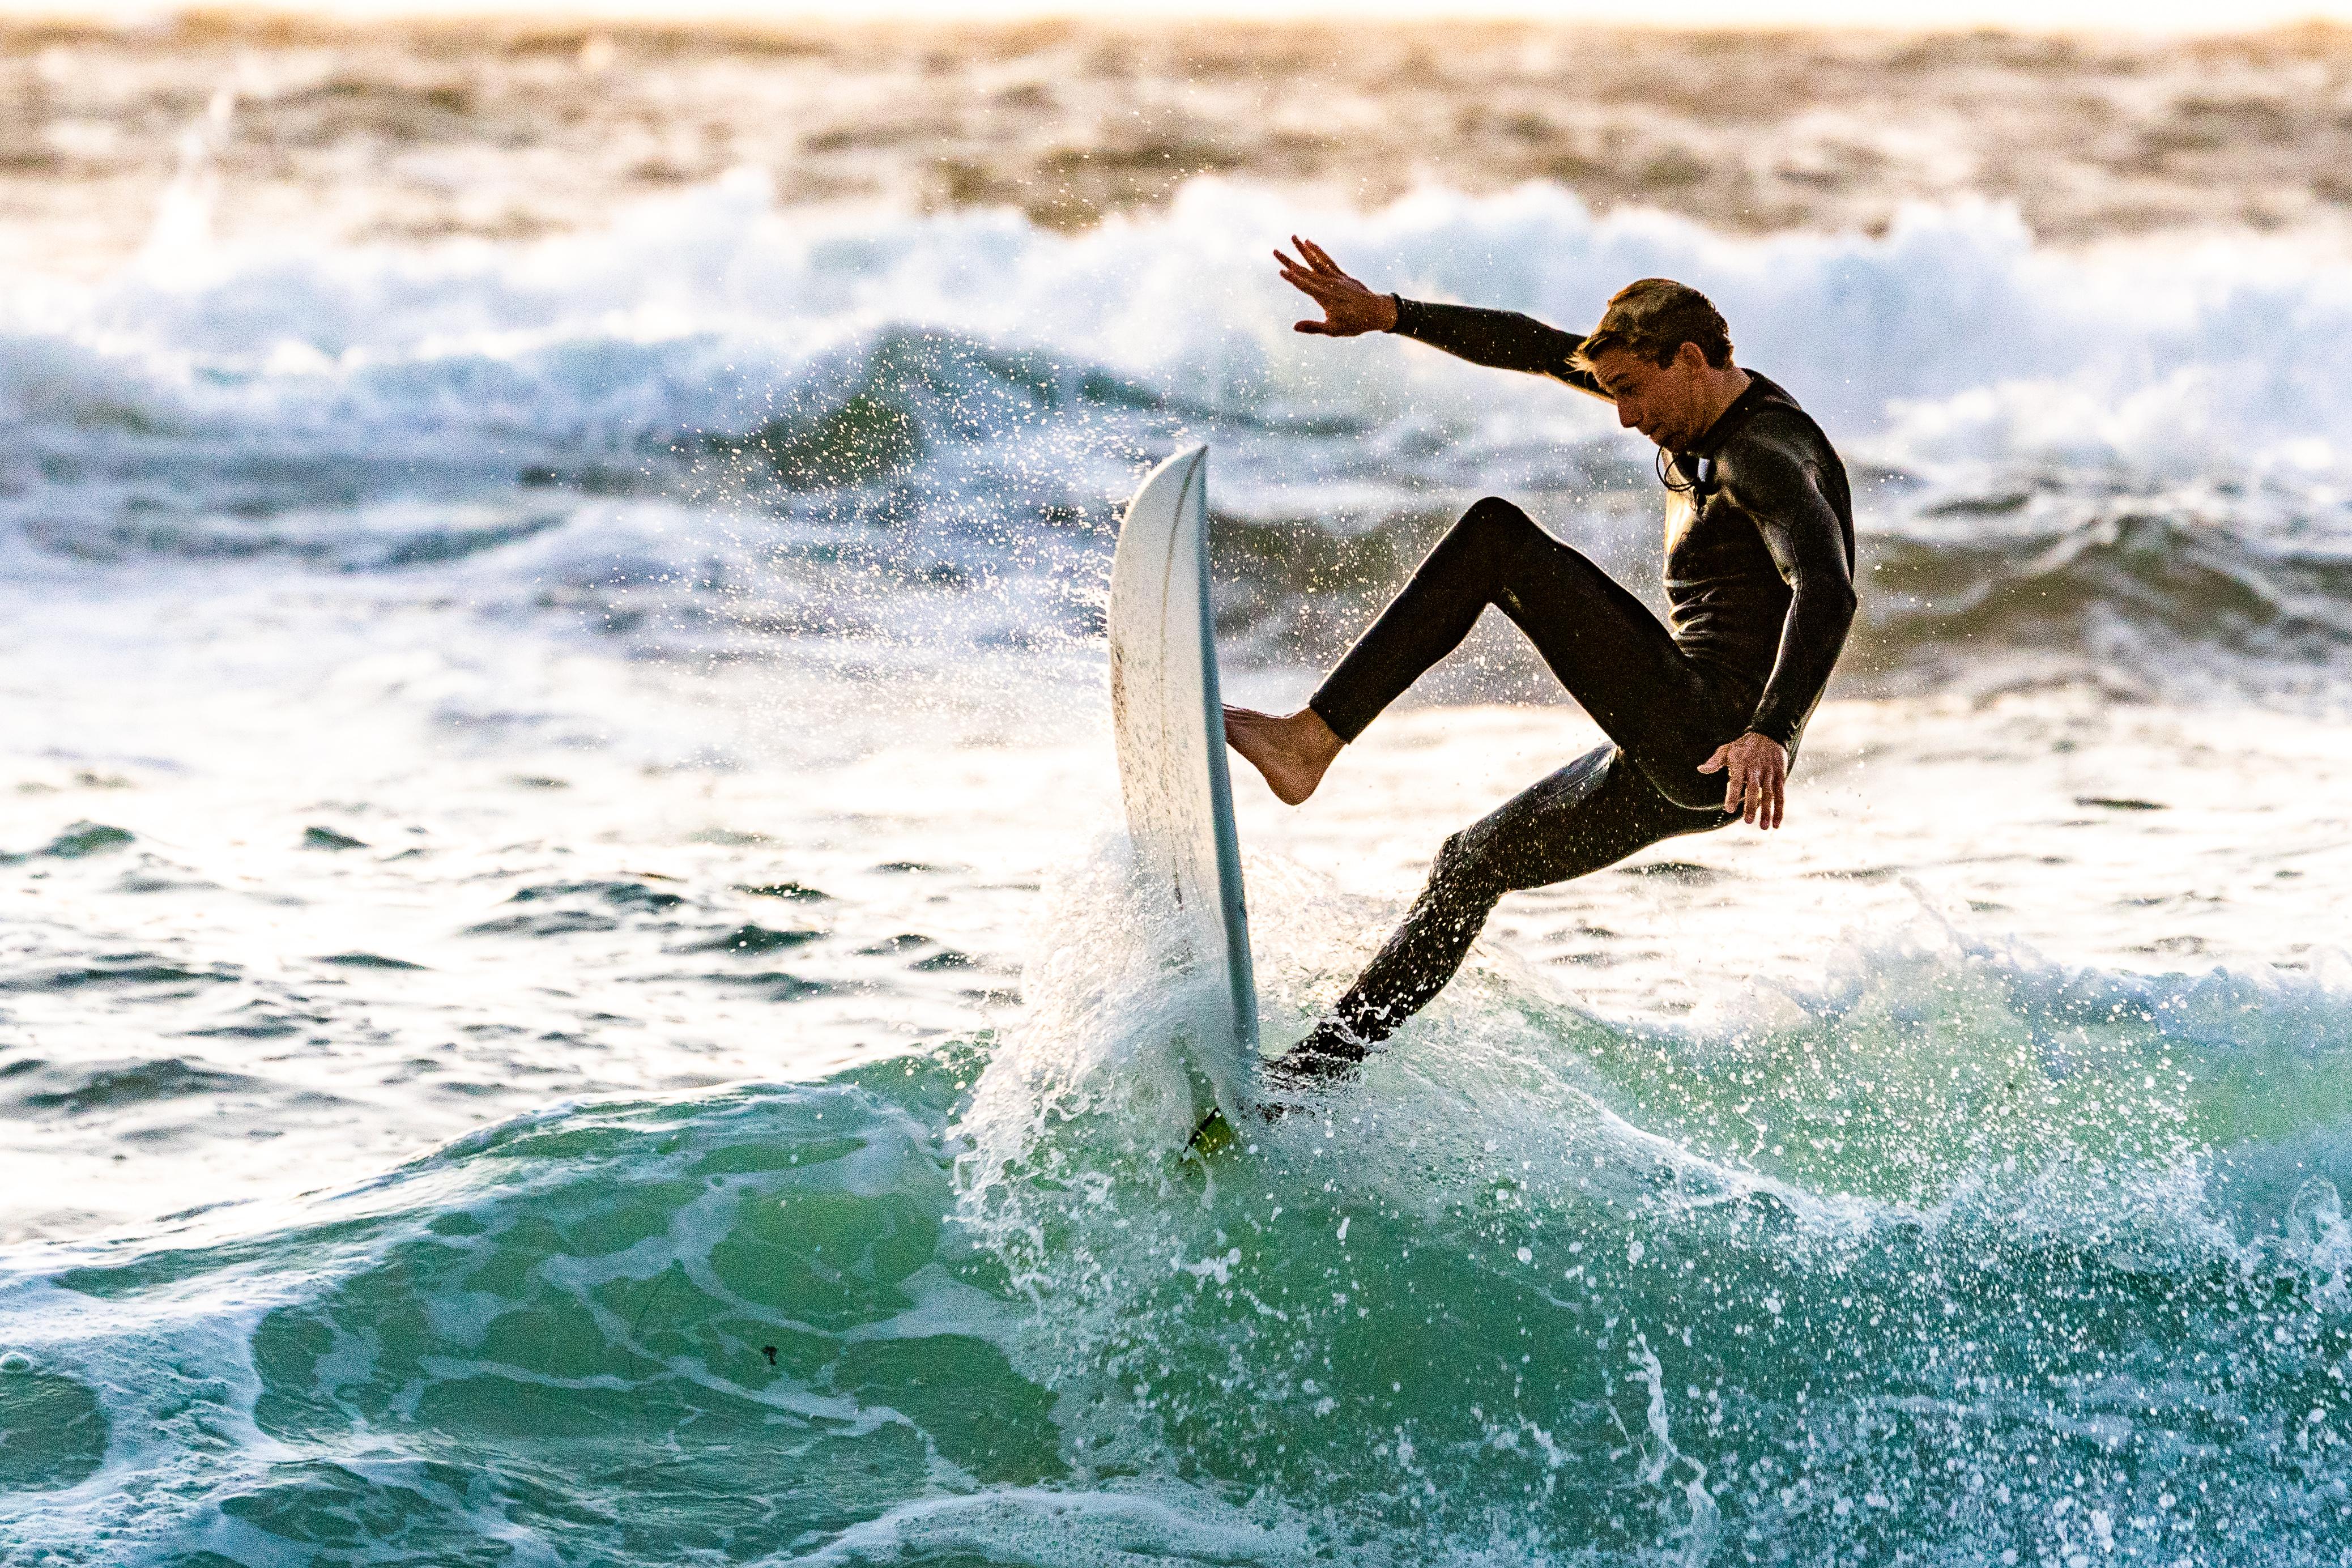 surfer performing tricks